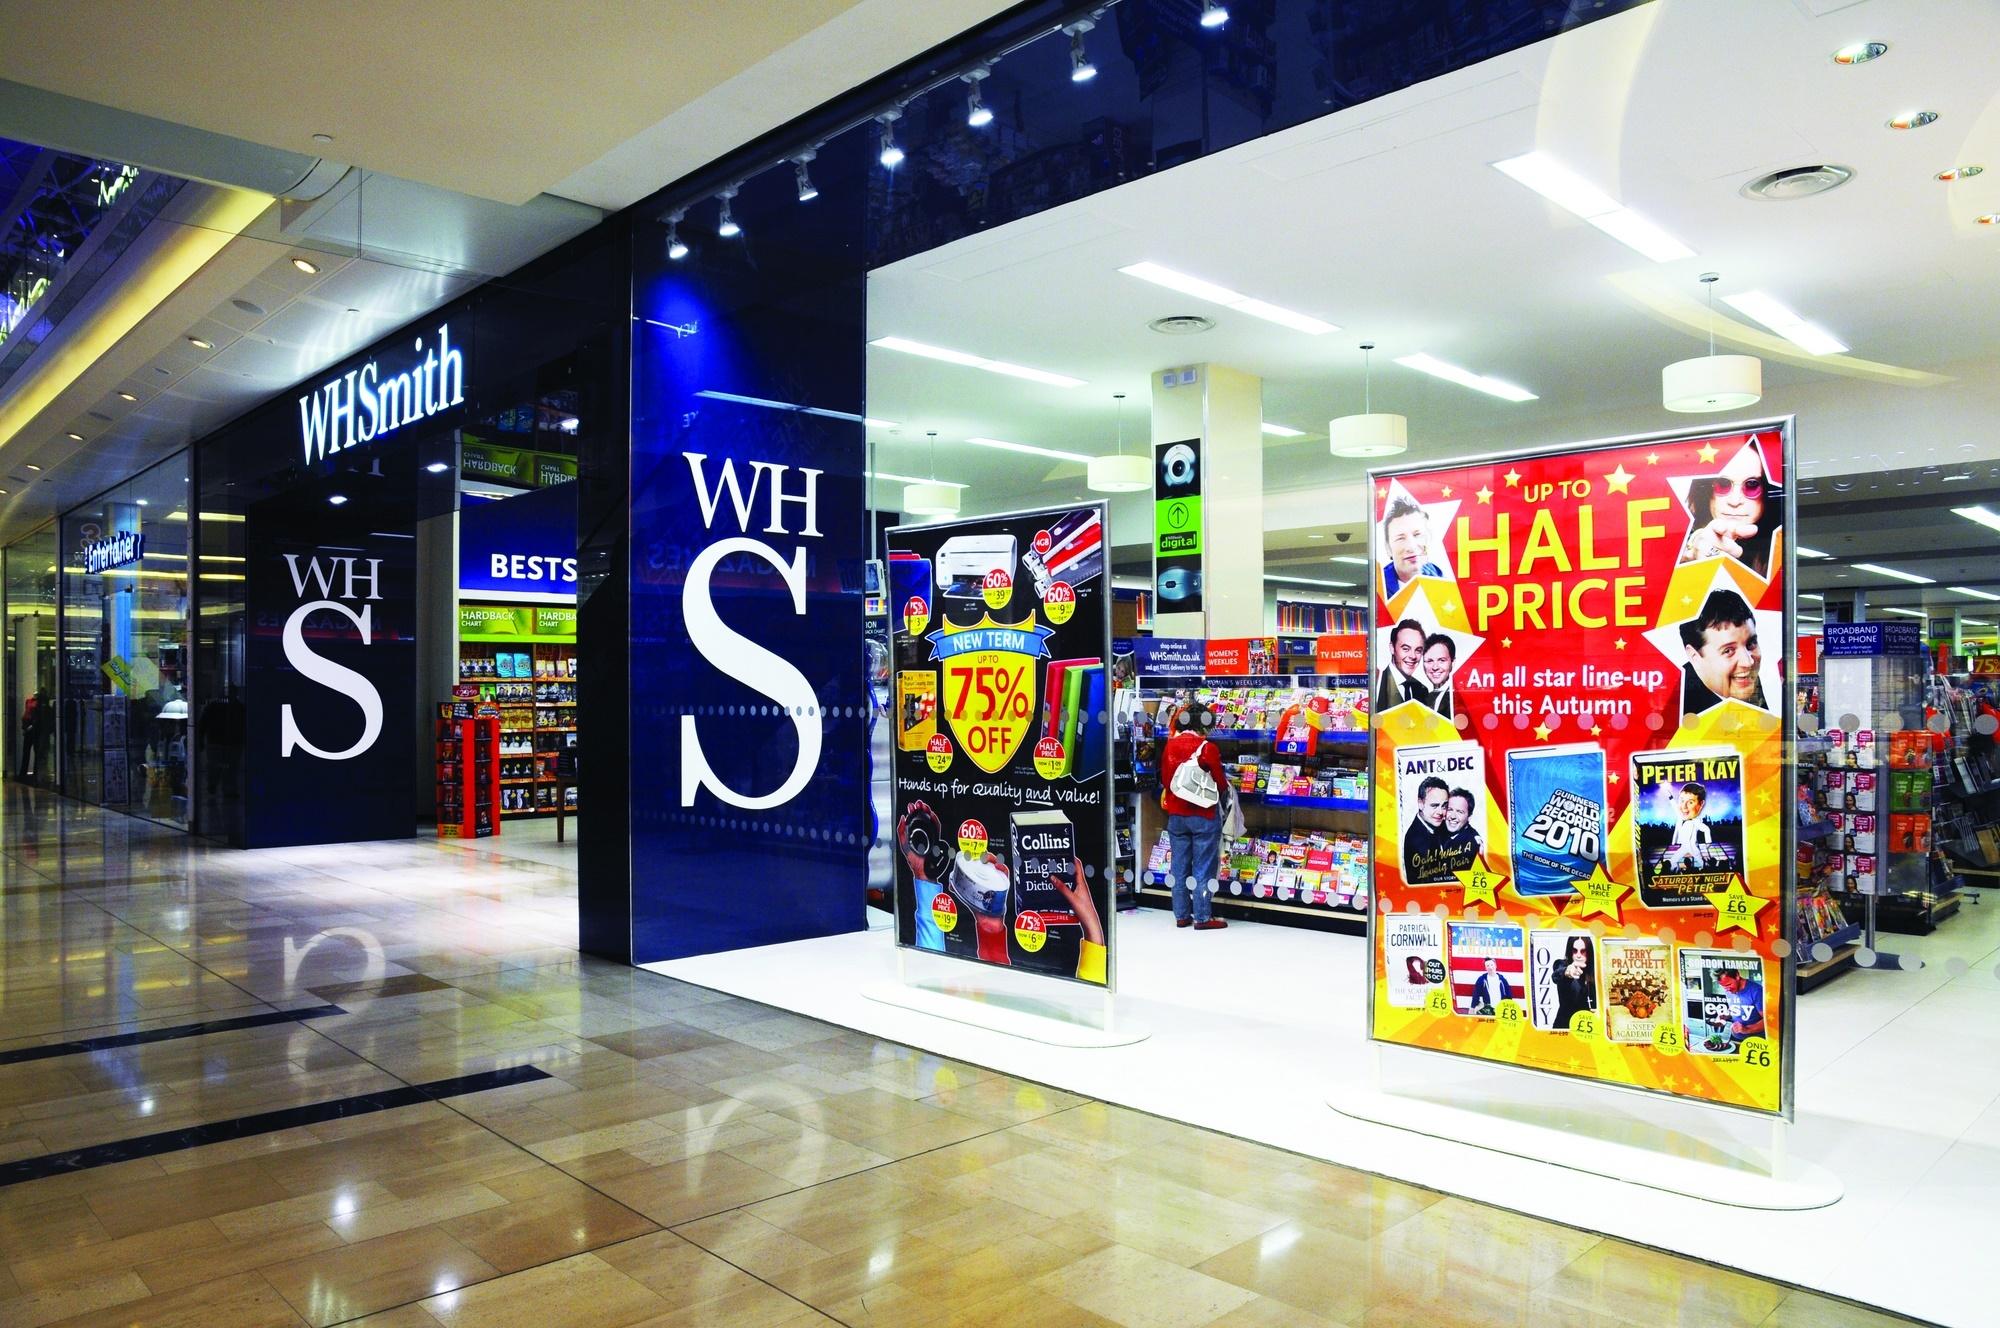 Westfield White City Floor Plan Whsmith Inaugura Locales En Espa 241 A Y Om 225 N Per 250 Retail